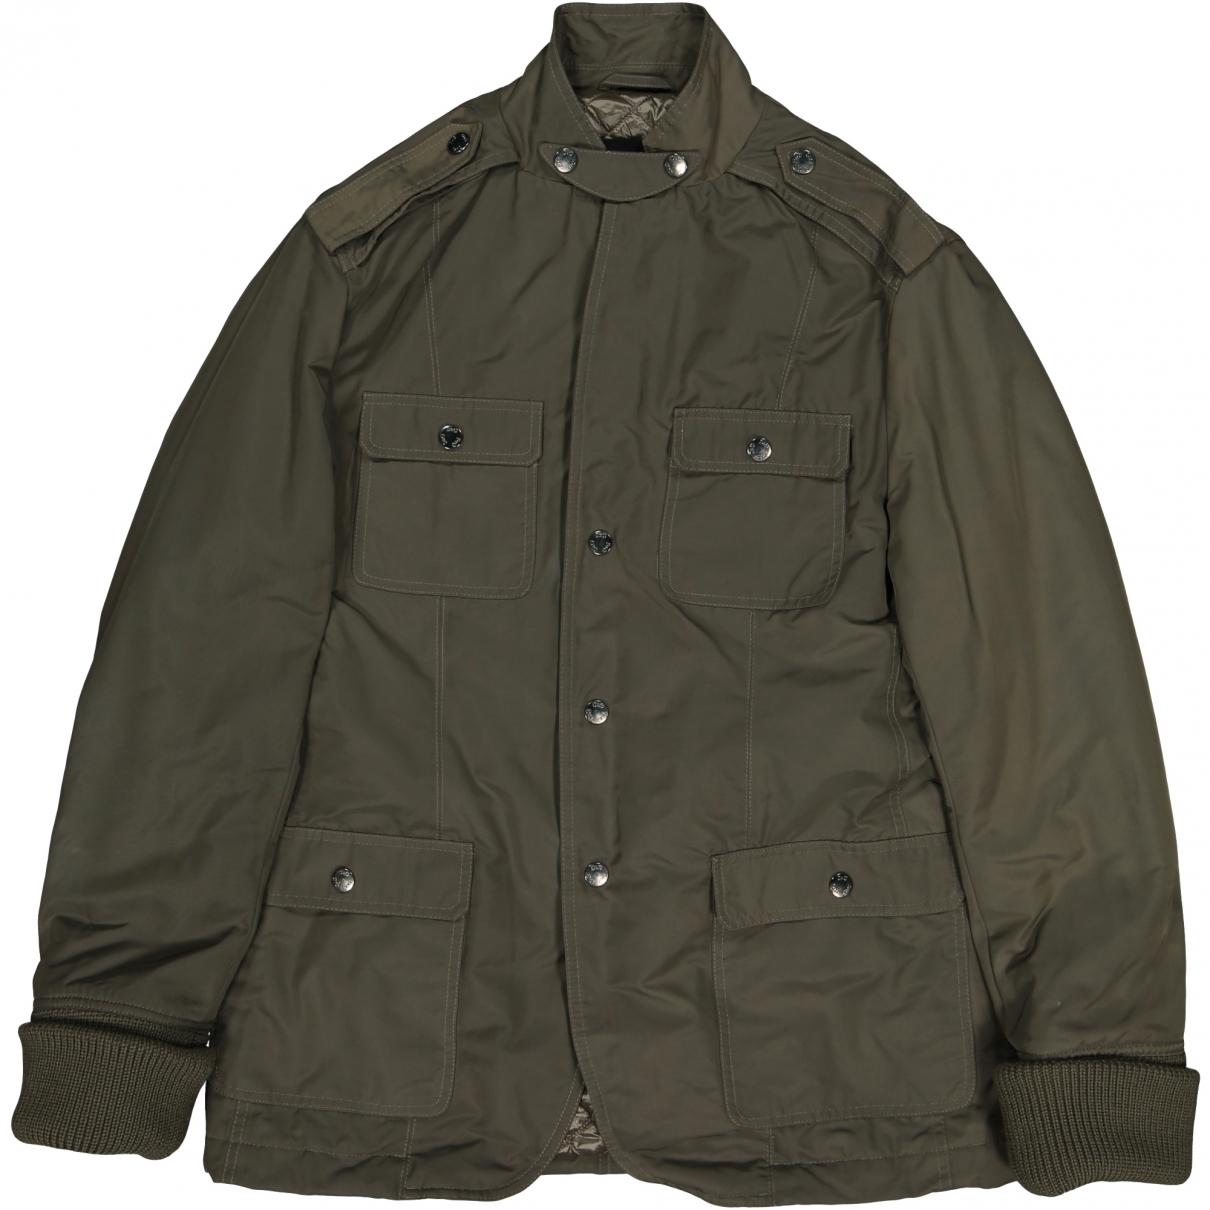 D&g \N Khaki jacket  for Men 52 IT